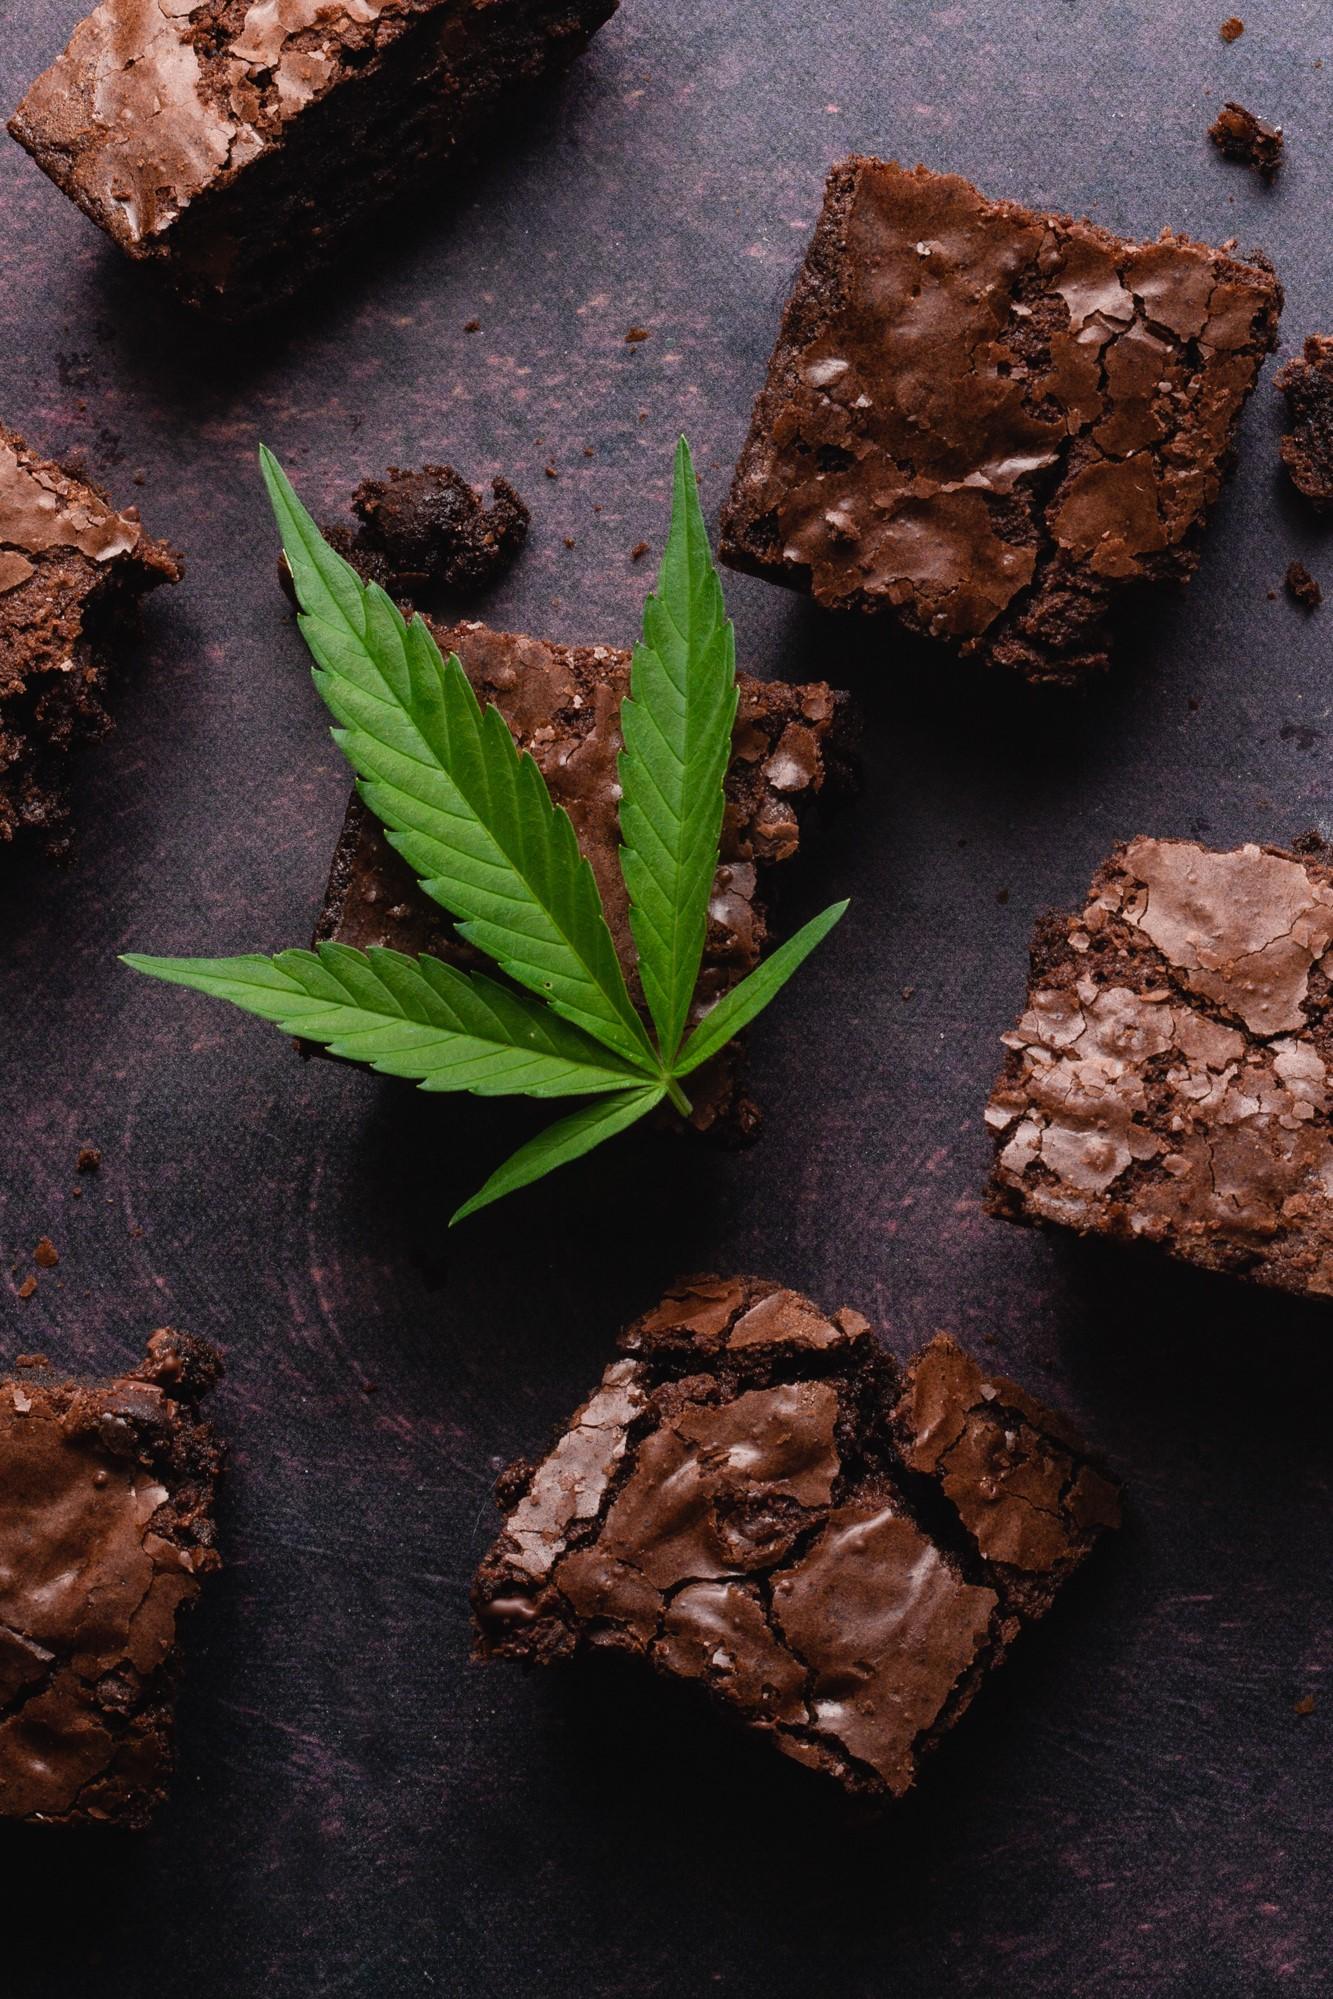 Pot brownies displayed with a marijuana leaf. Hashish fudge is part of the history of cannabis chocolates.